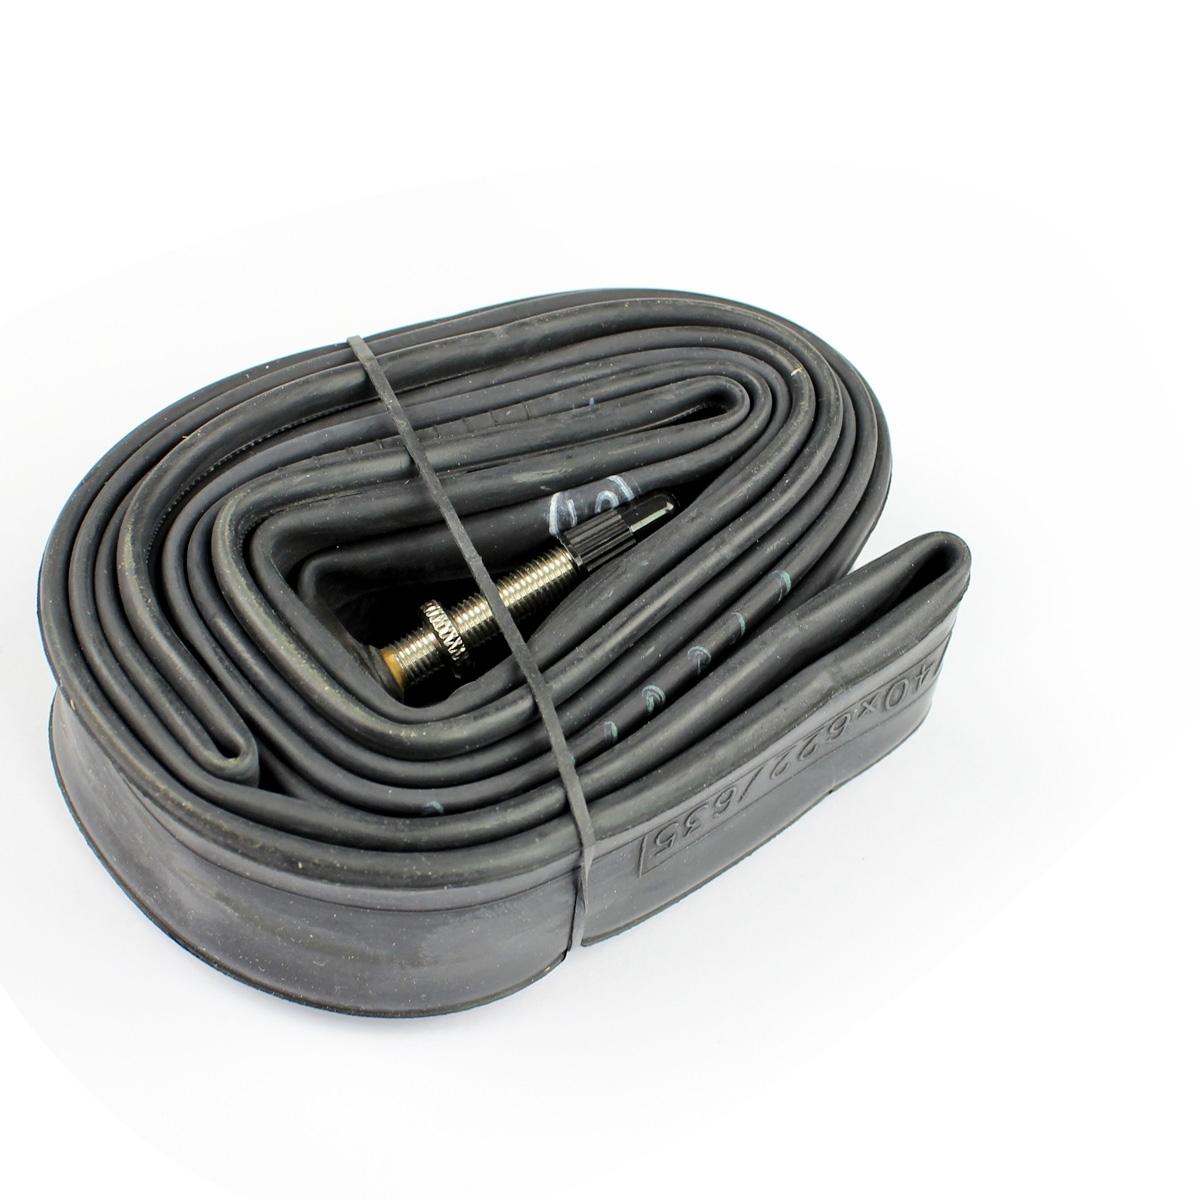 Chambre à air Michelin A3 Airstop 700x35/40 Valve 40 mm Presta (Vrac)